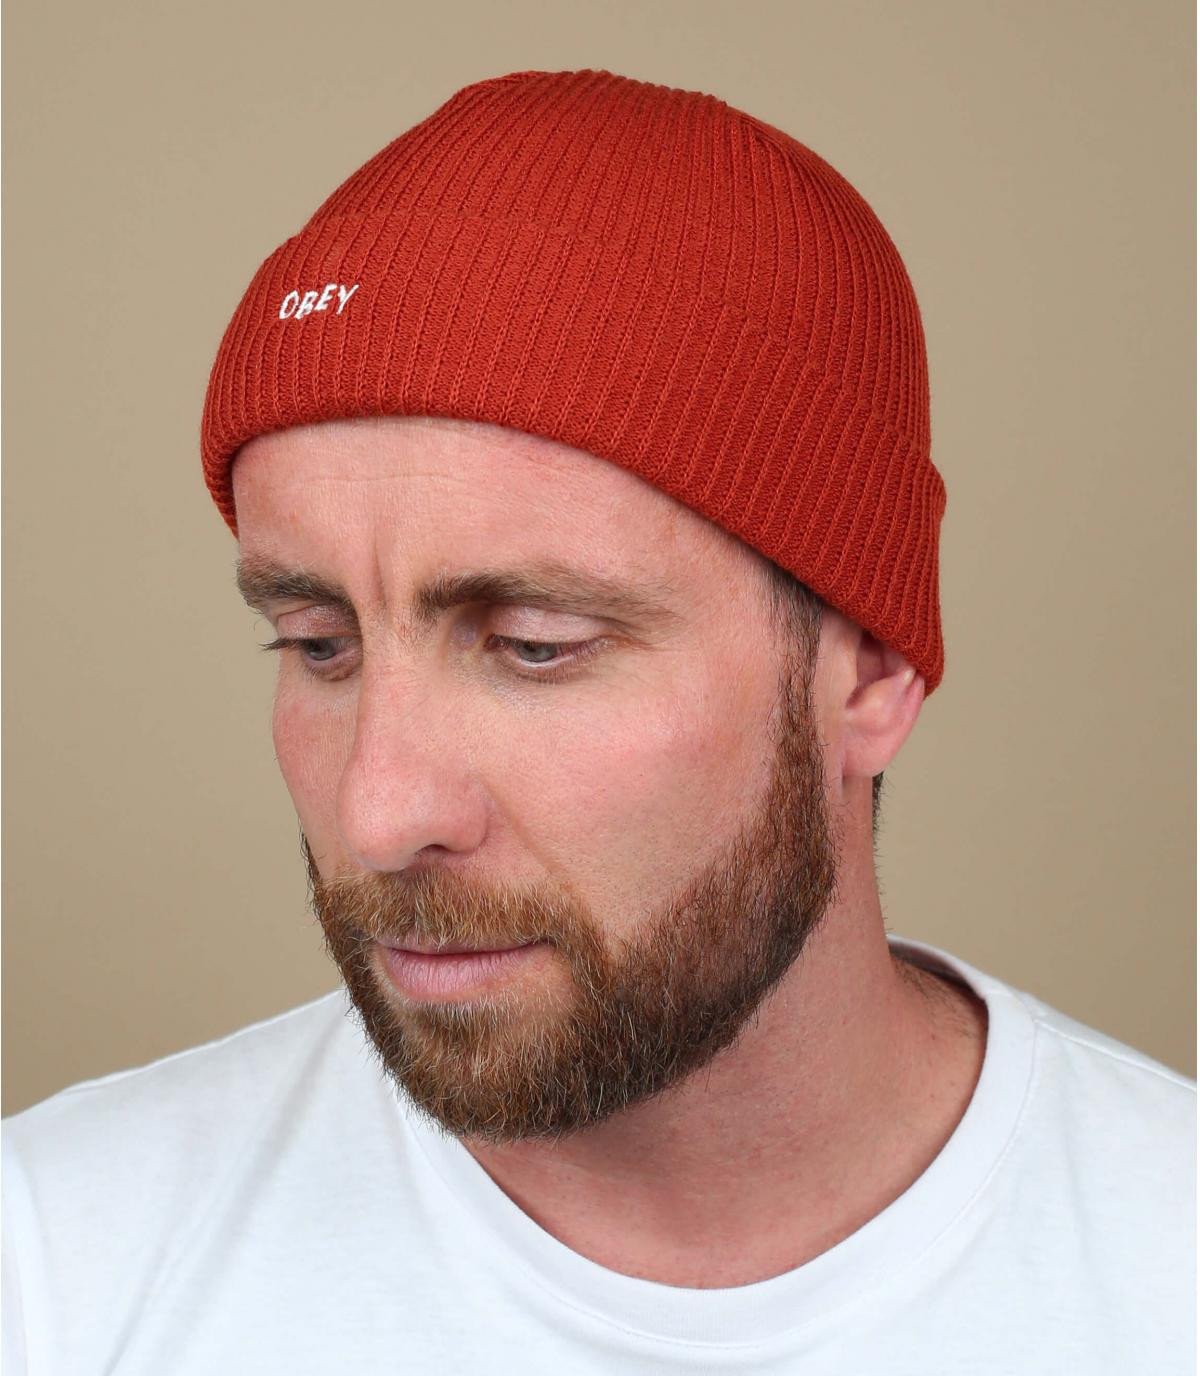 Mütze Rand rot Obey